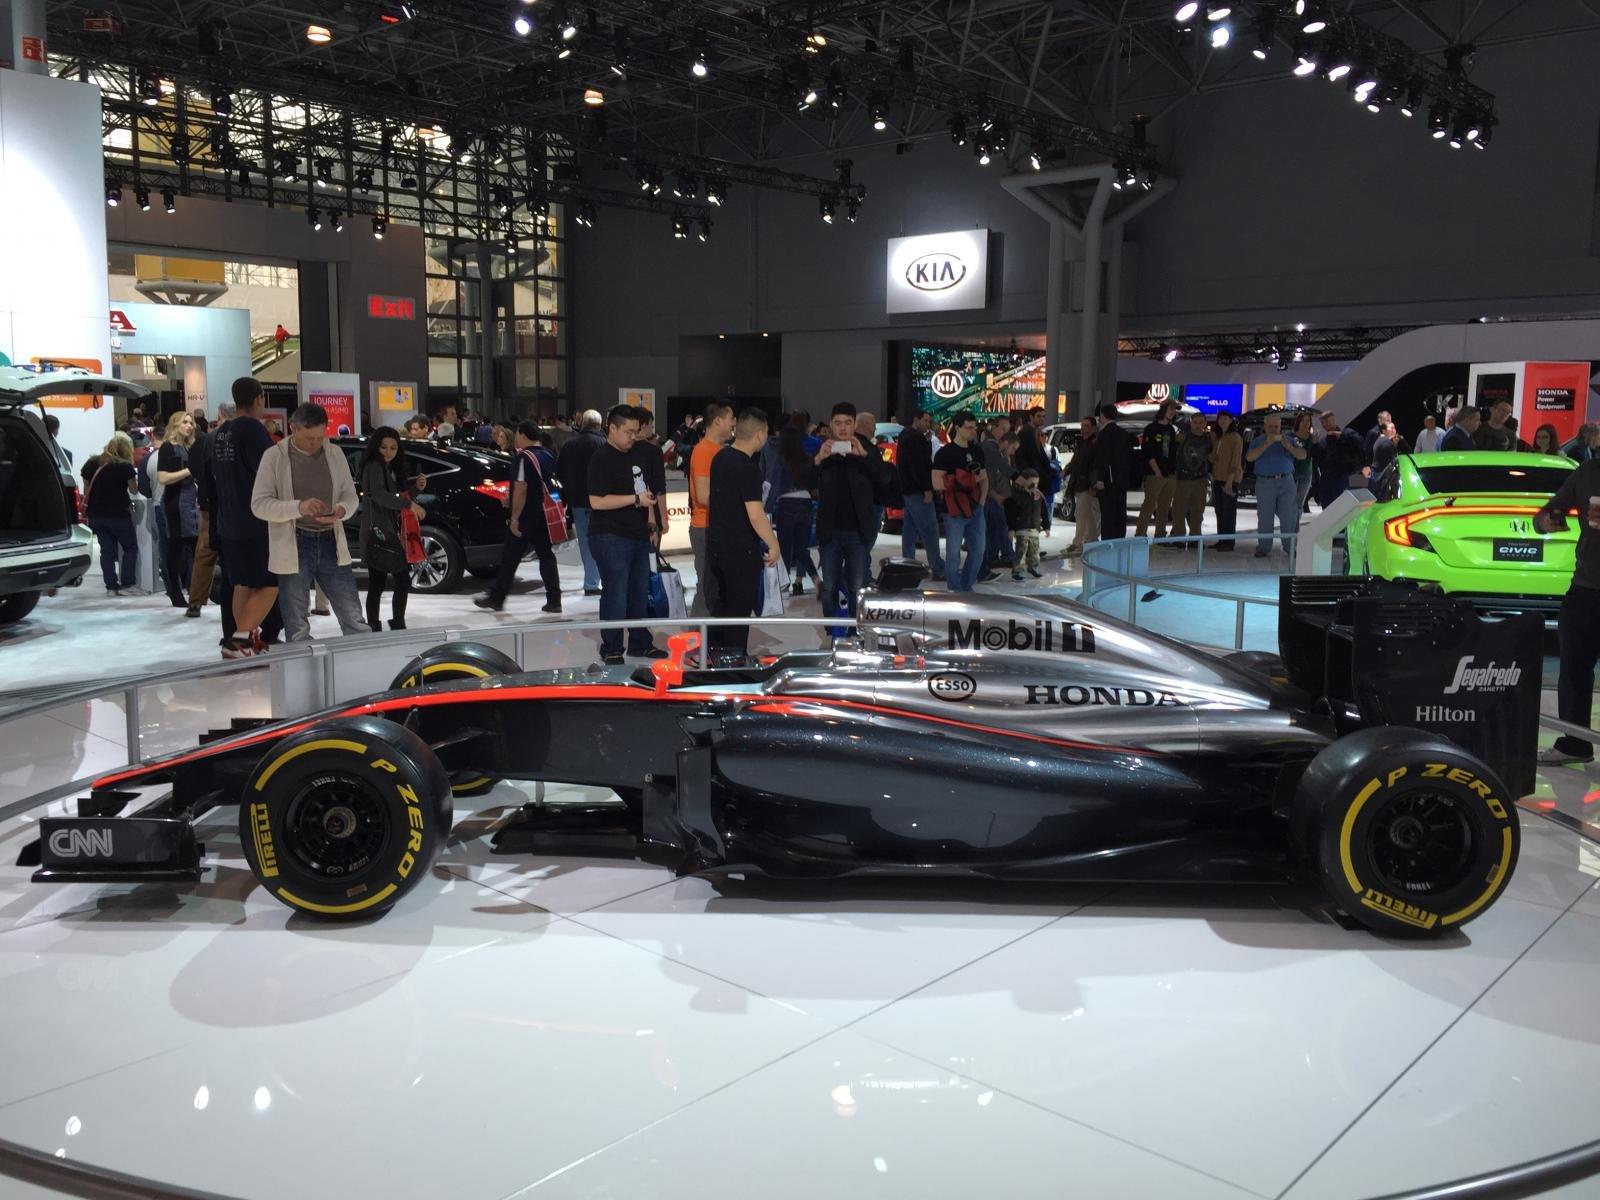 New York Auto Show Jacob Javits Center - Javits center car show